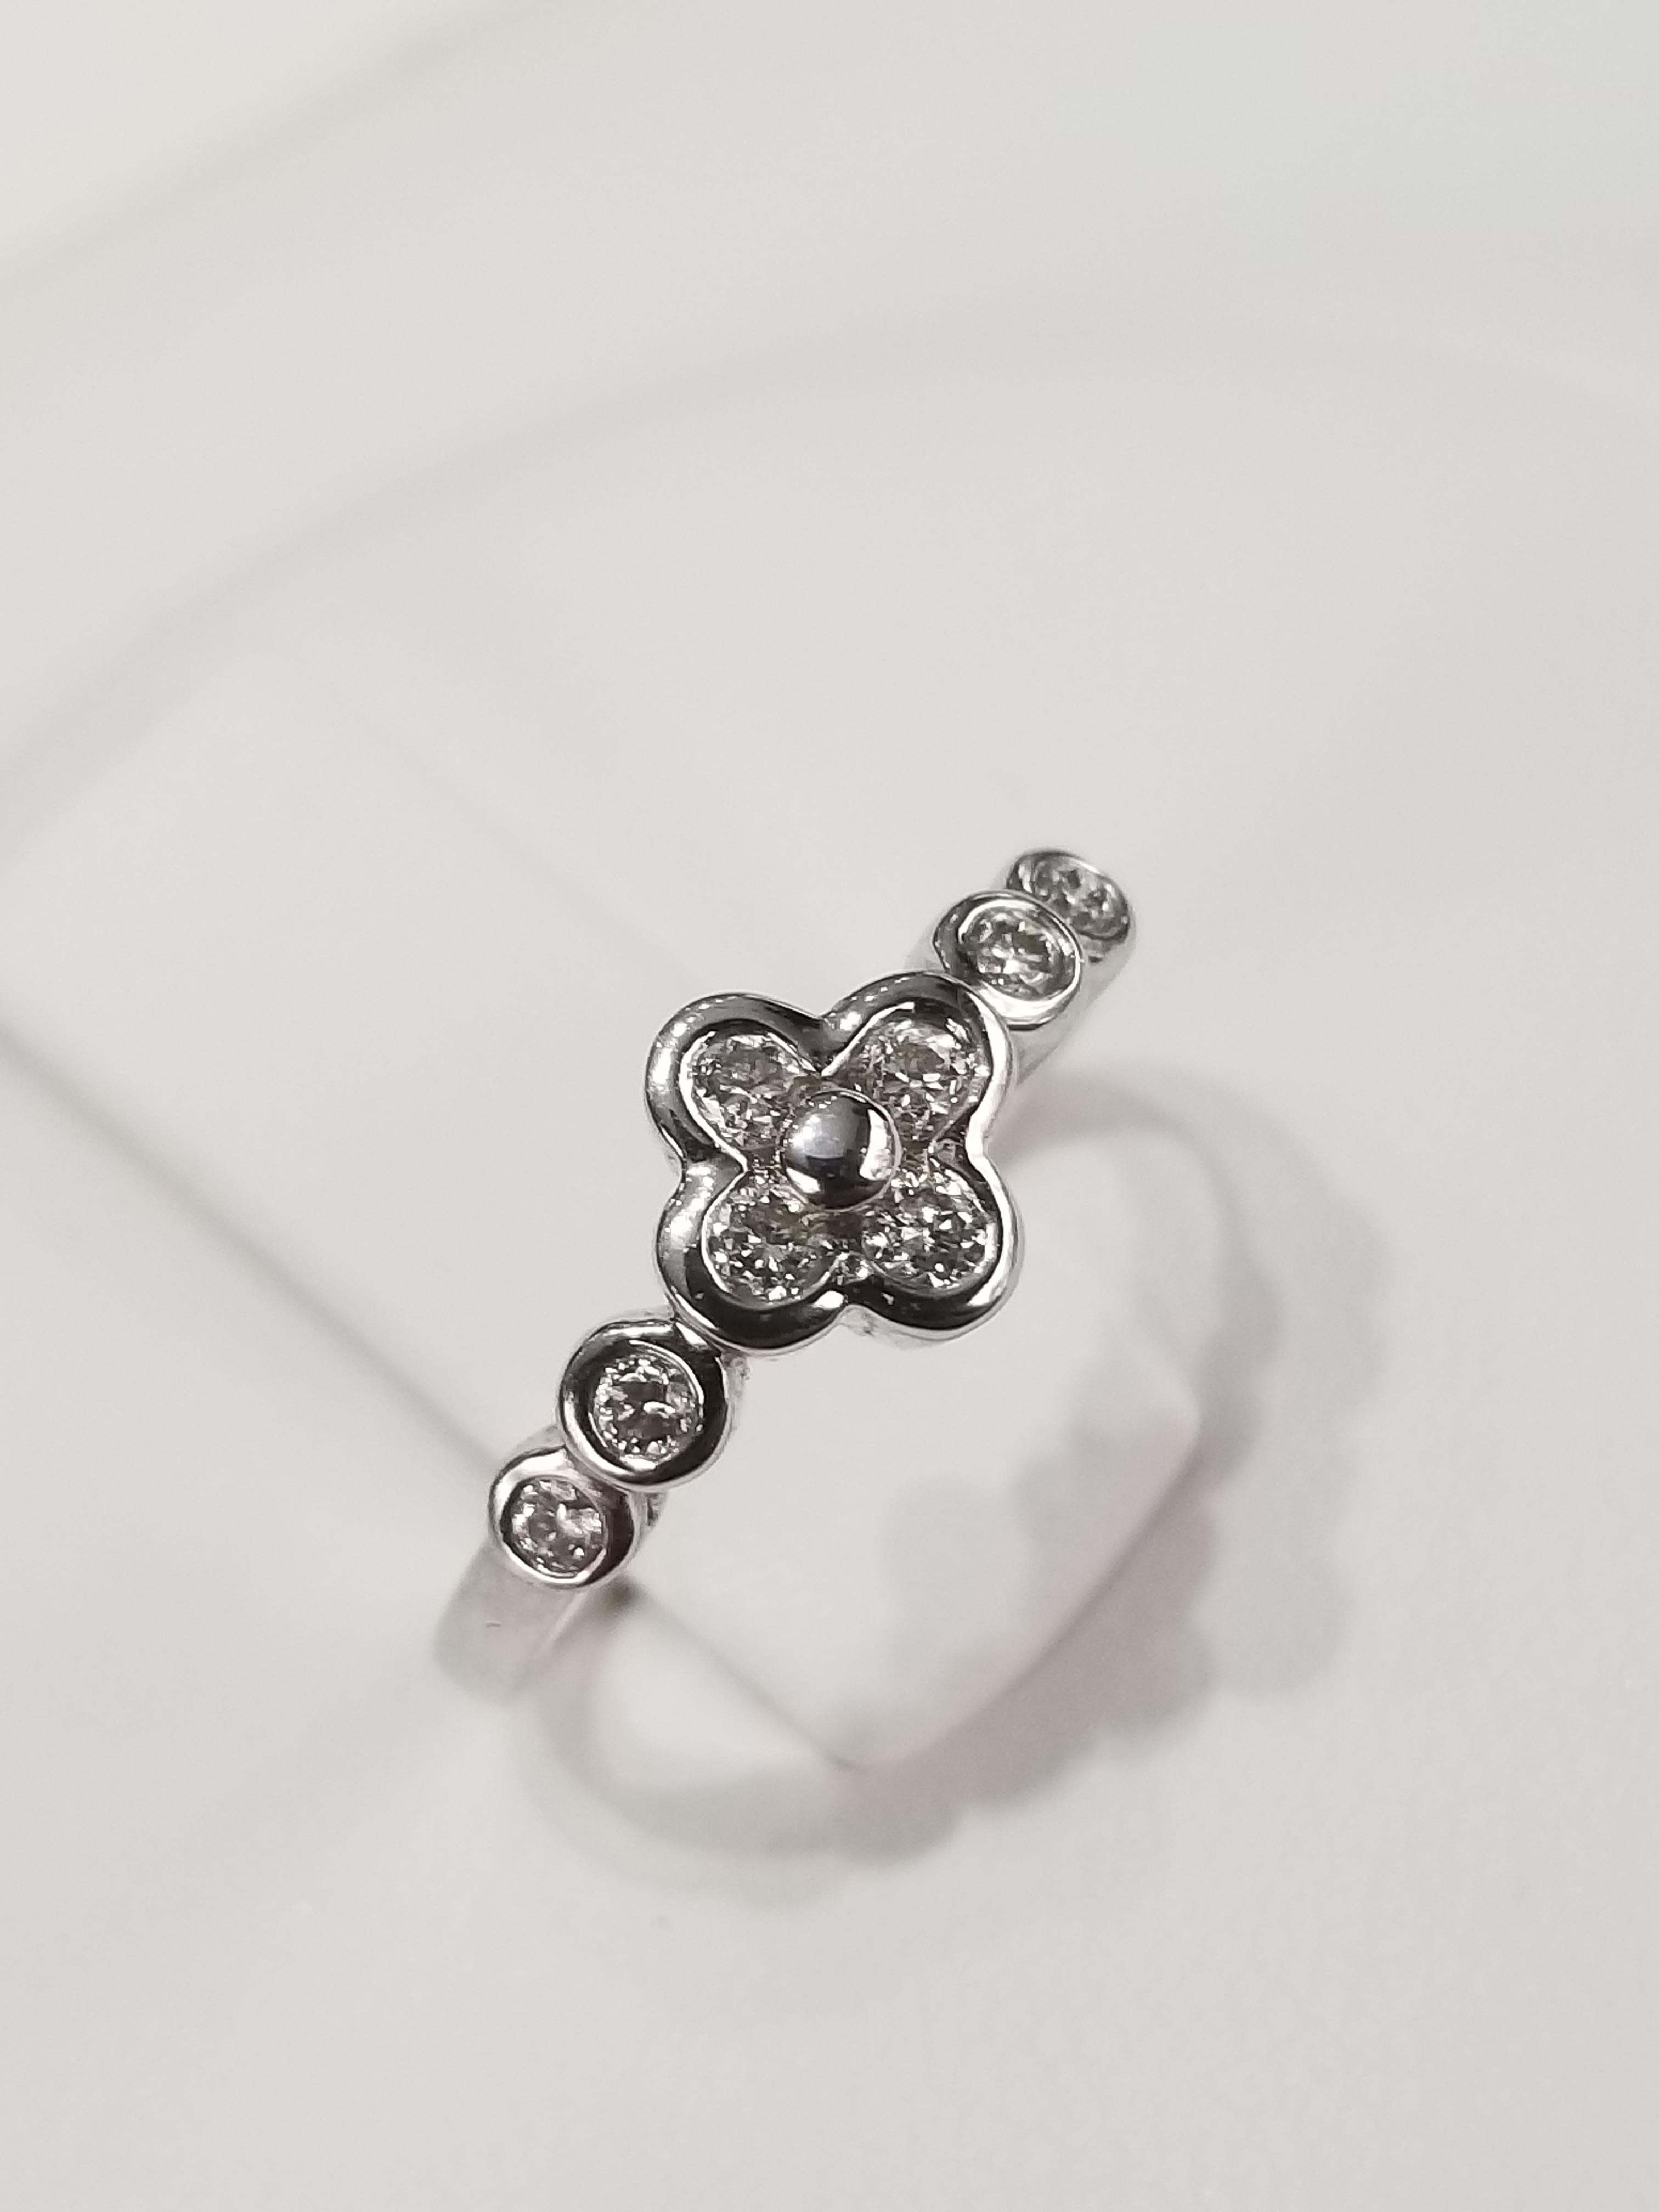 18K White Gold Diamonds: 0.30ct Regular Price $2100 SALE $595 Ref: BK320